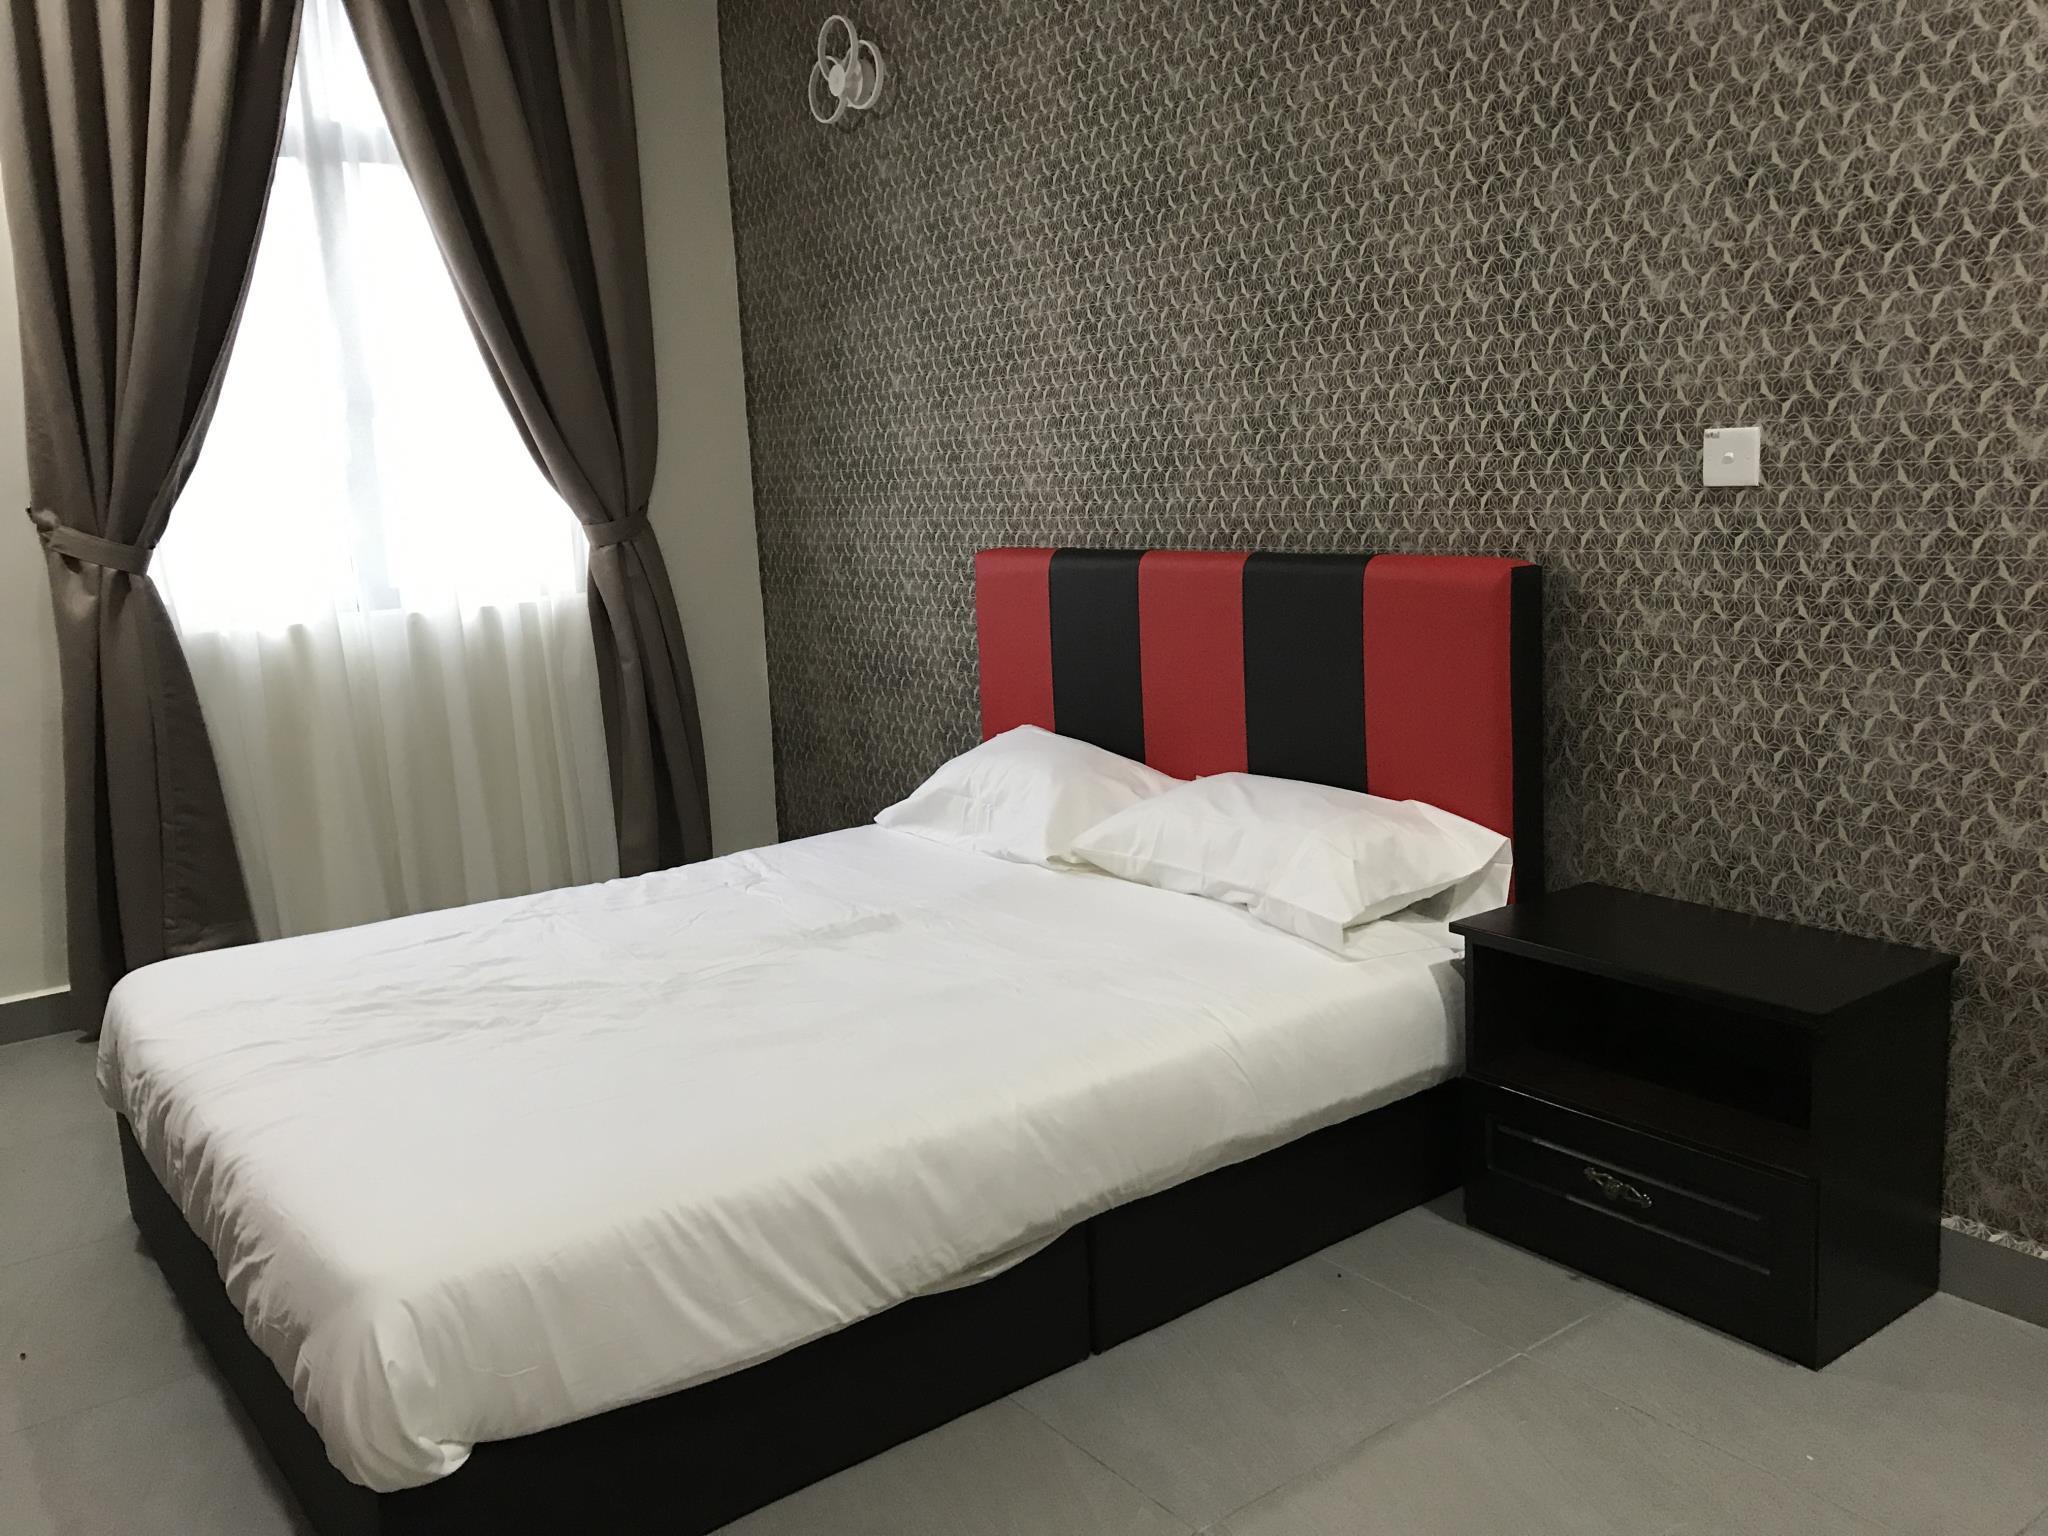 Maxims Tasik Mutiara Holiday House